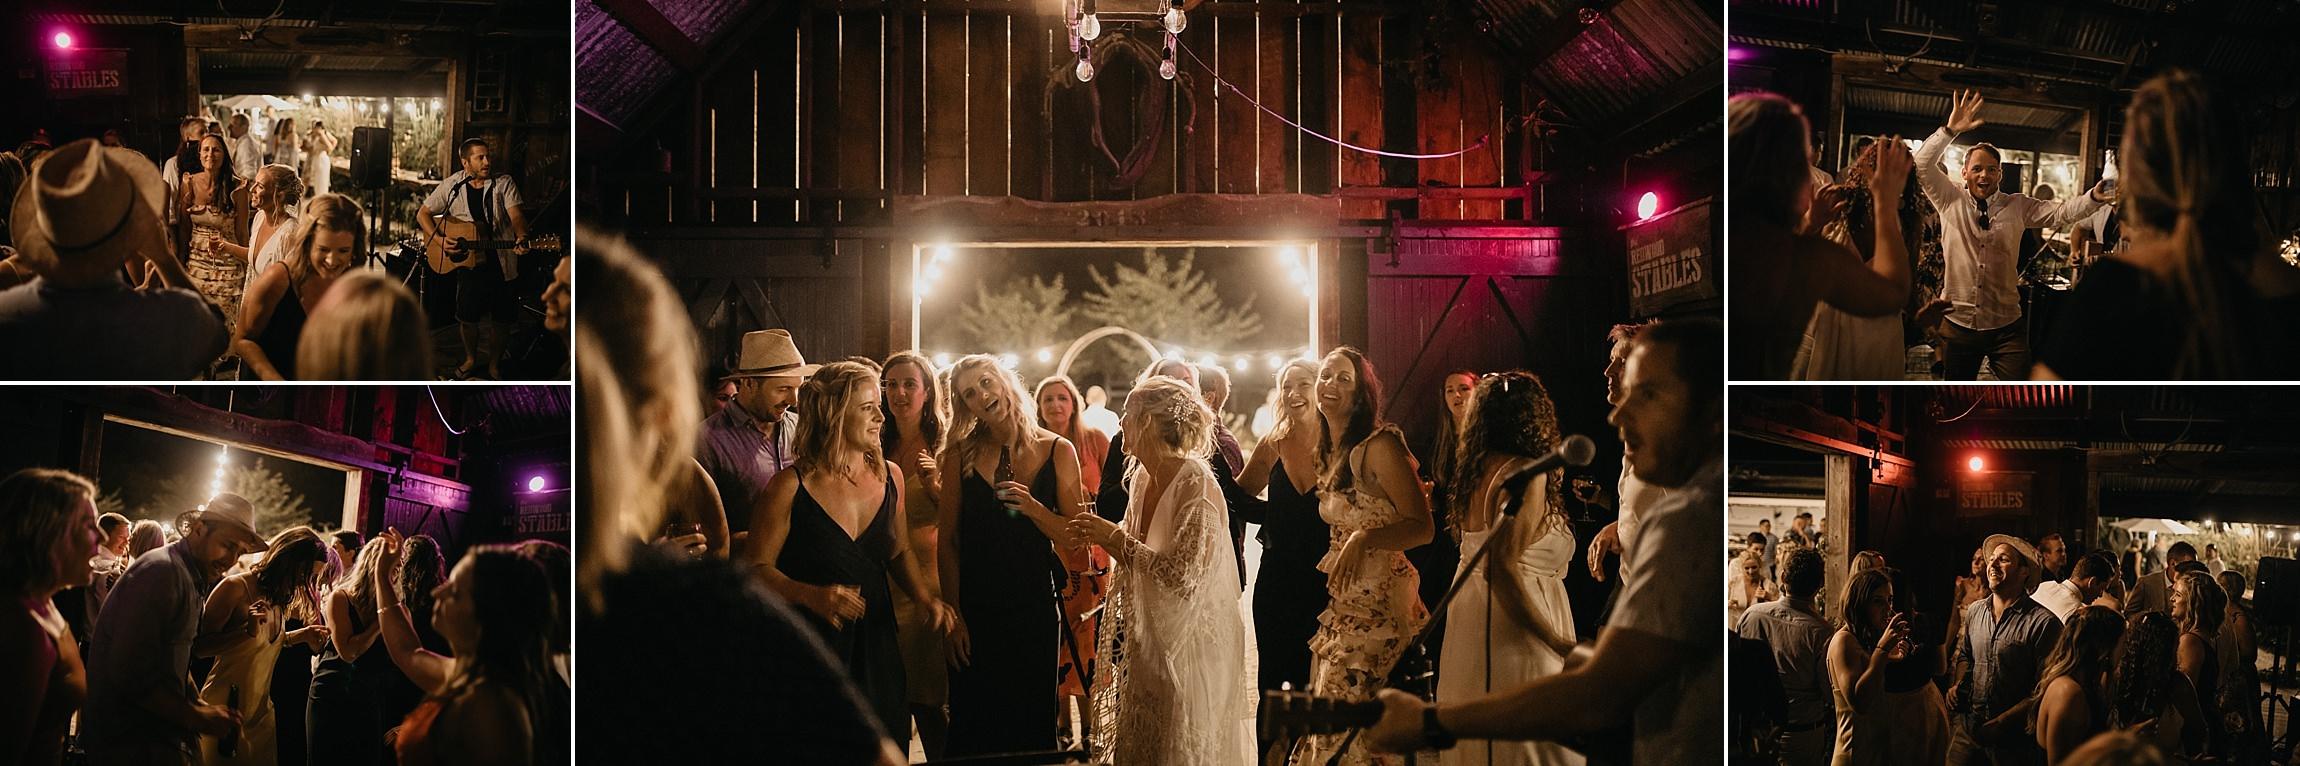 oldforestschool-wedding-blog-205.jpg